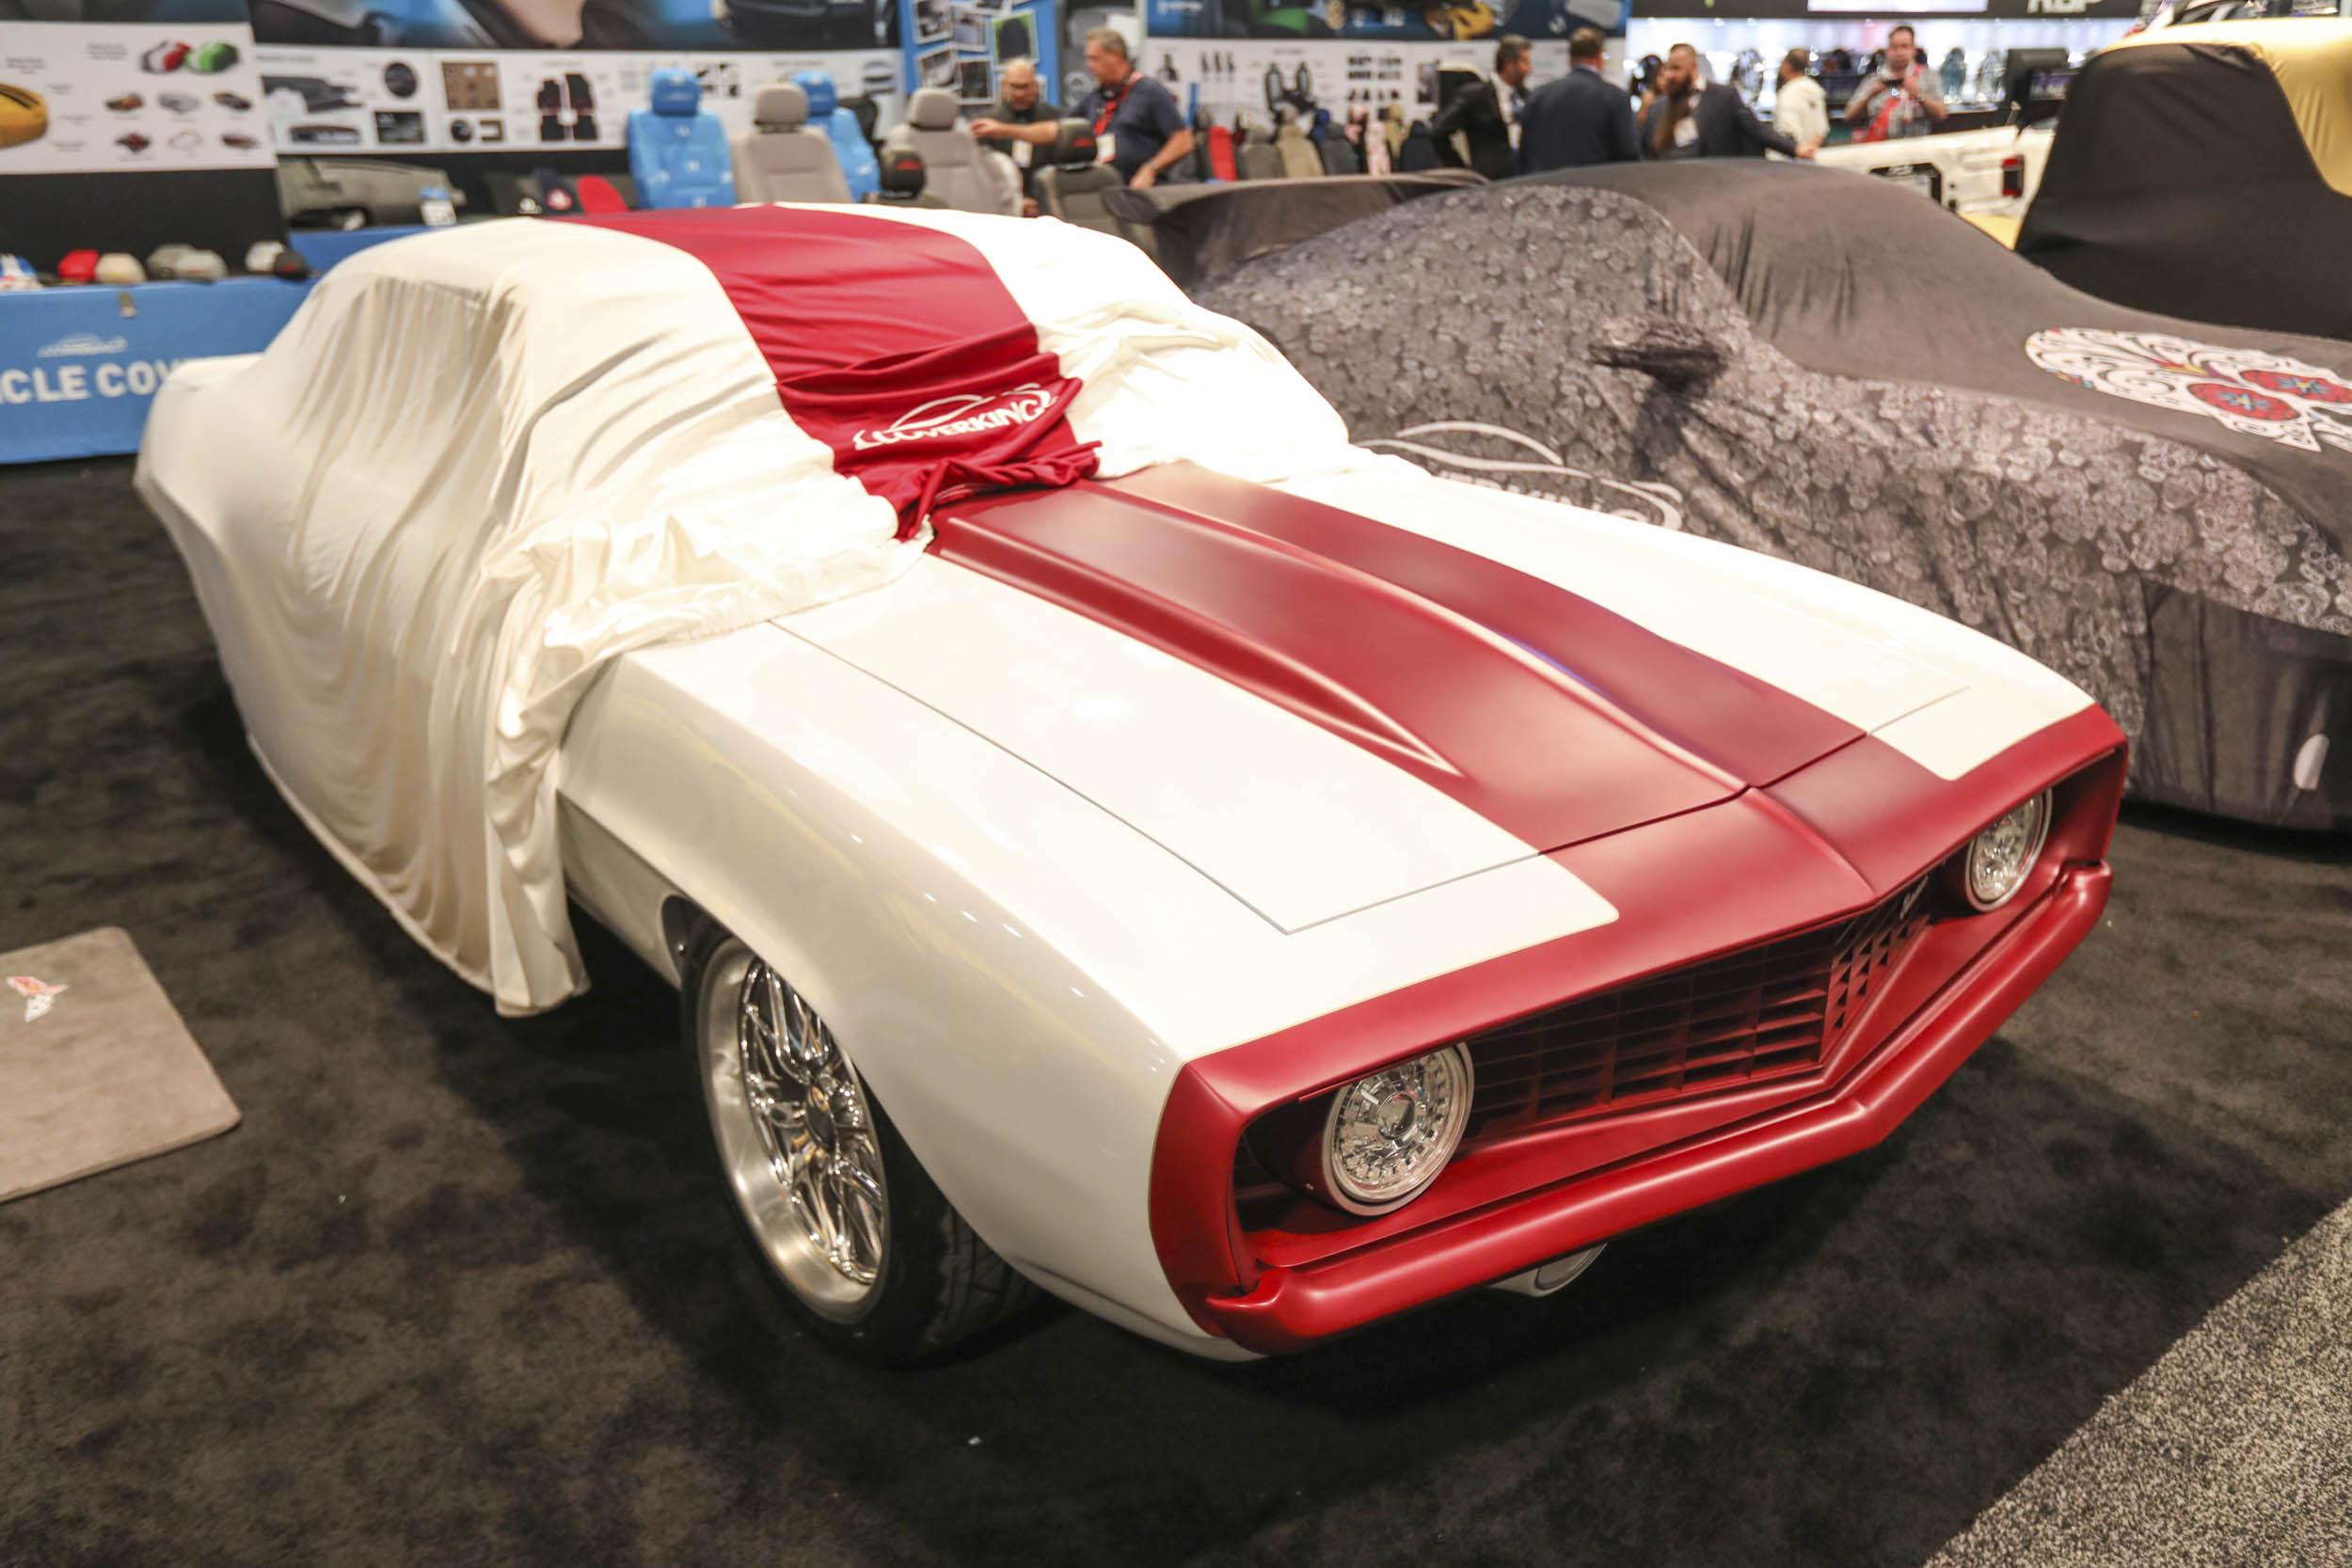 SEMA car under cover